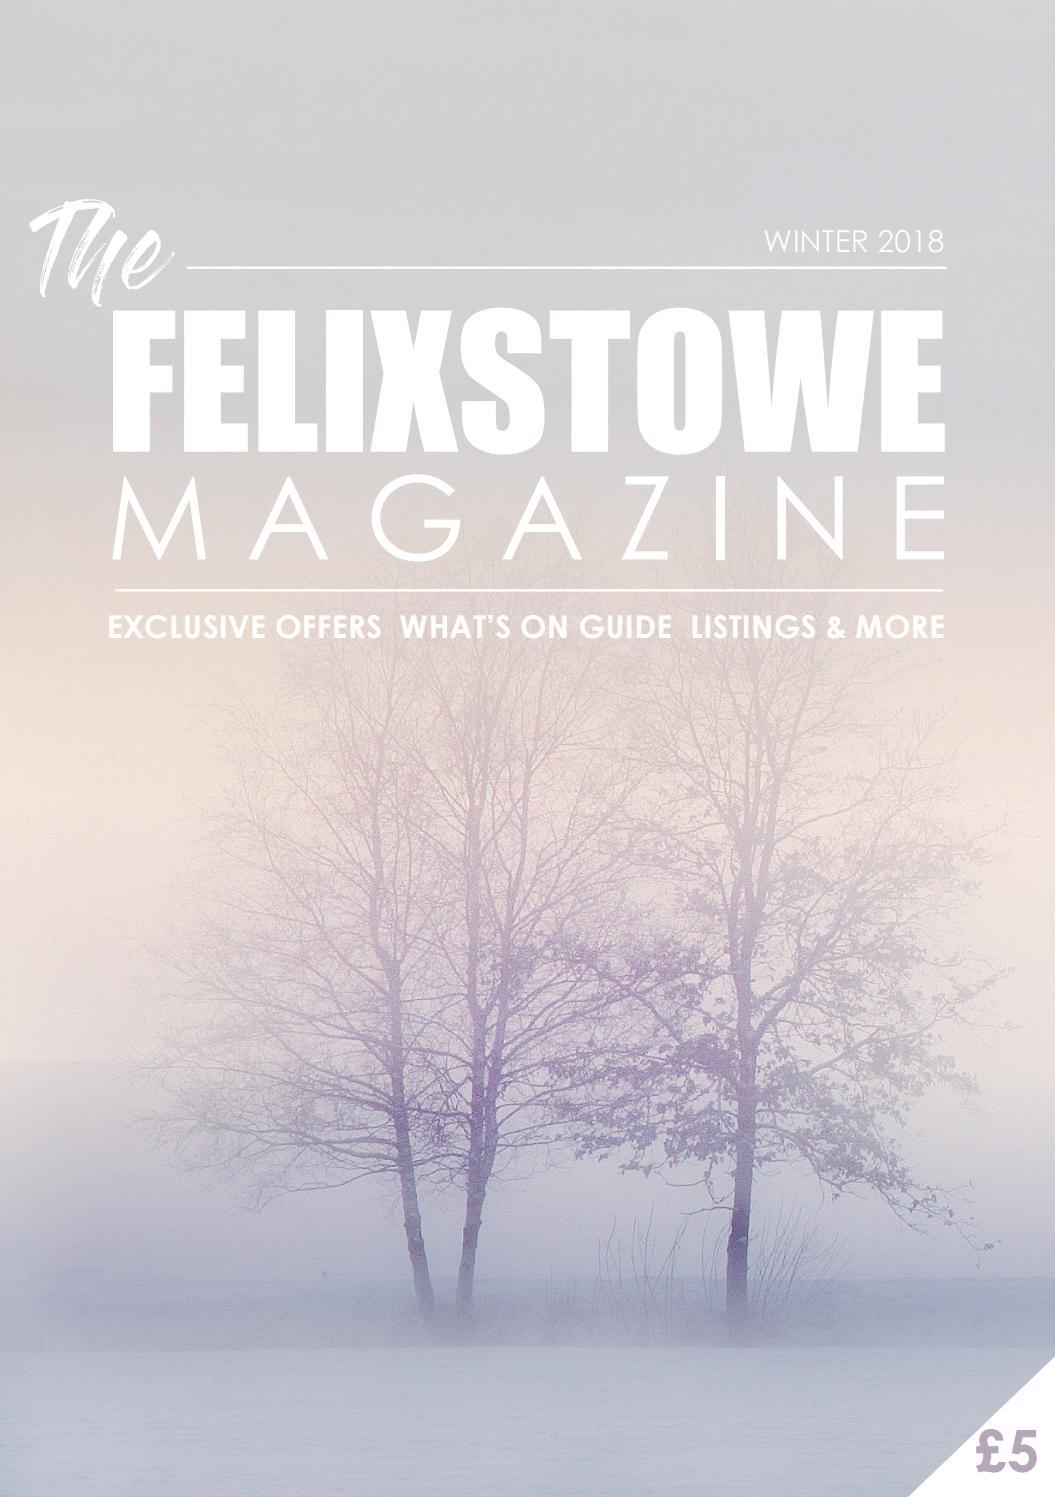 f742d8f7b08a The Felixstowe Magazine - Winter 2018 by Birdy Publications Ltd - issuu